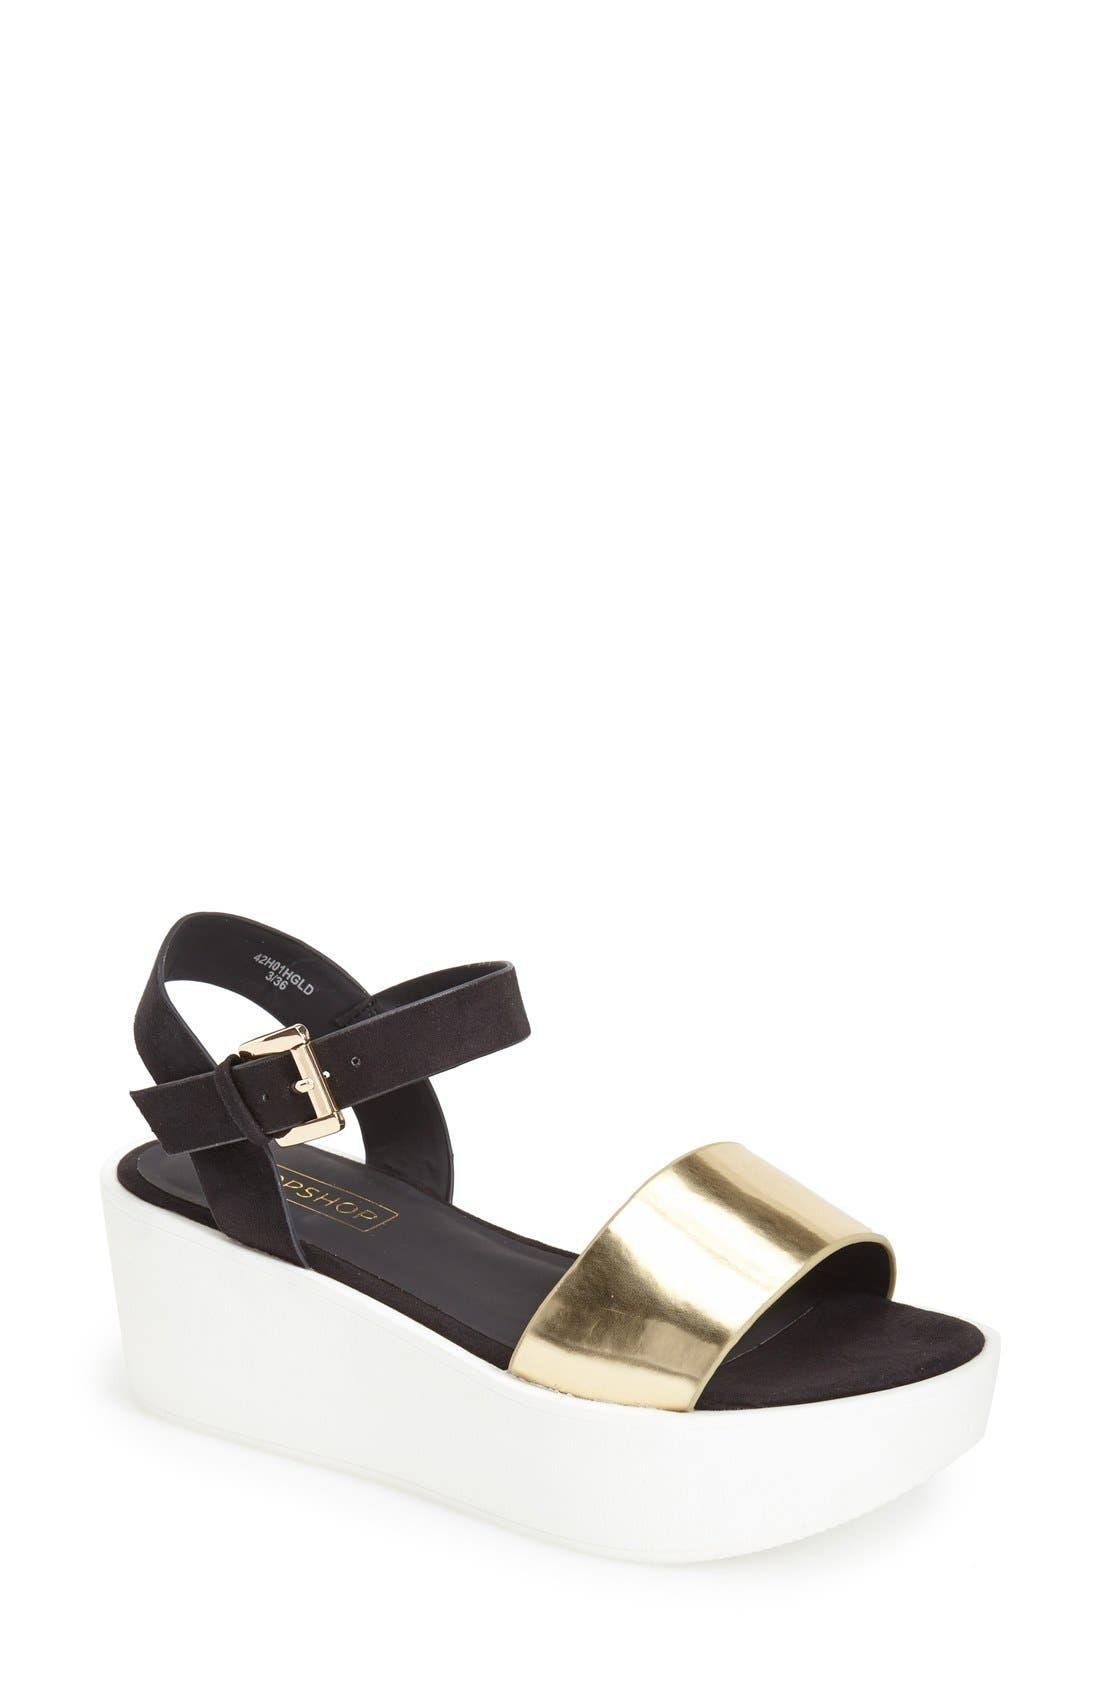 Main Image - Topshop 'Honey' Ankle Strap Wedge Platform Sandal (Women)